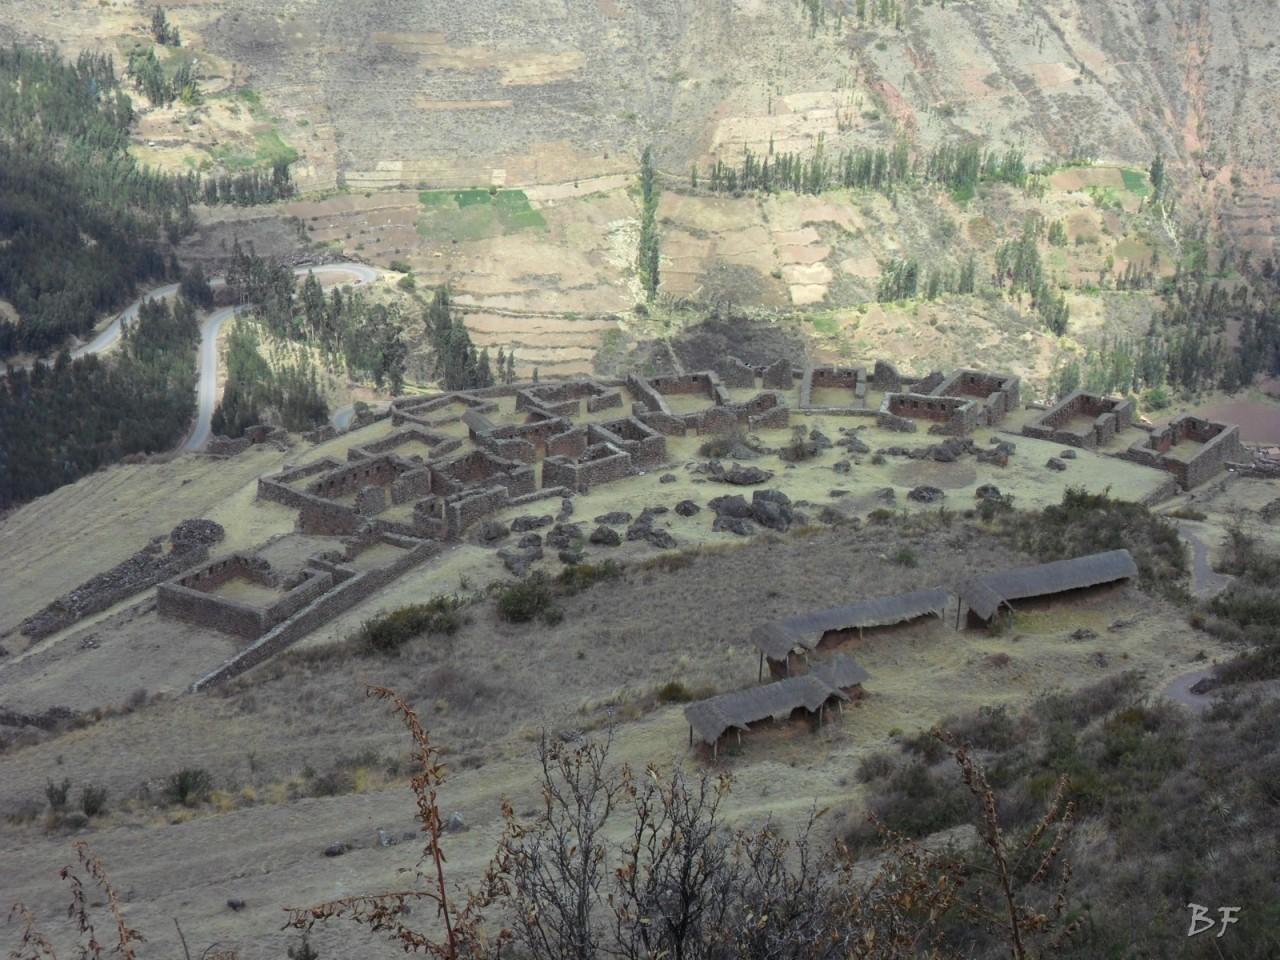 Mura-Poligonali-Megaliti-Altari-Rupestri-Pisac-Cusco-Perù-78